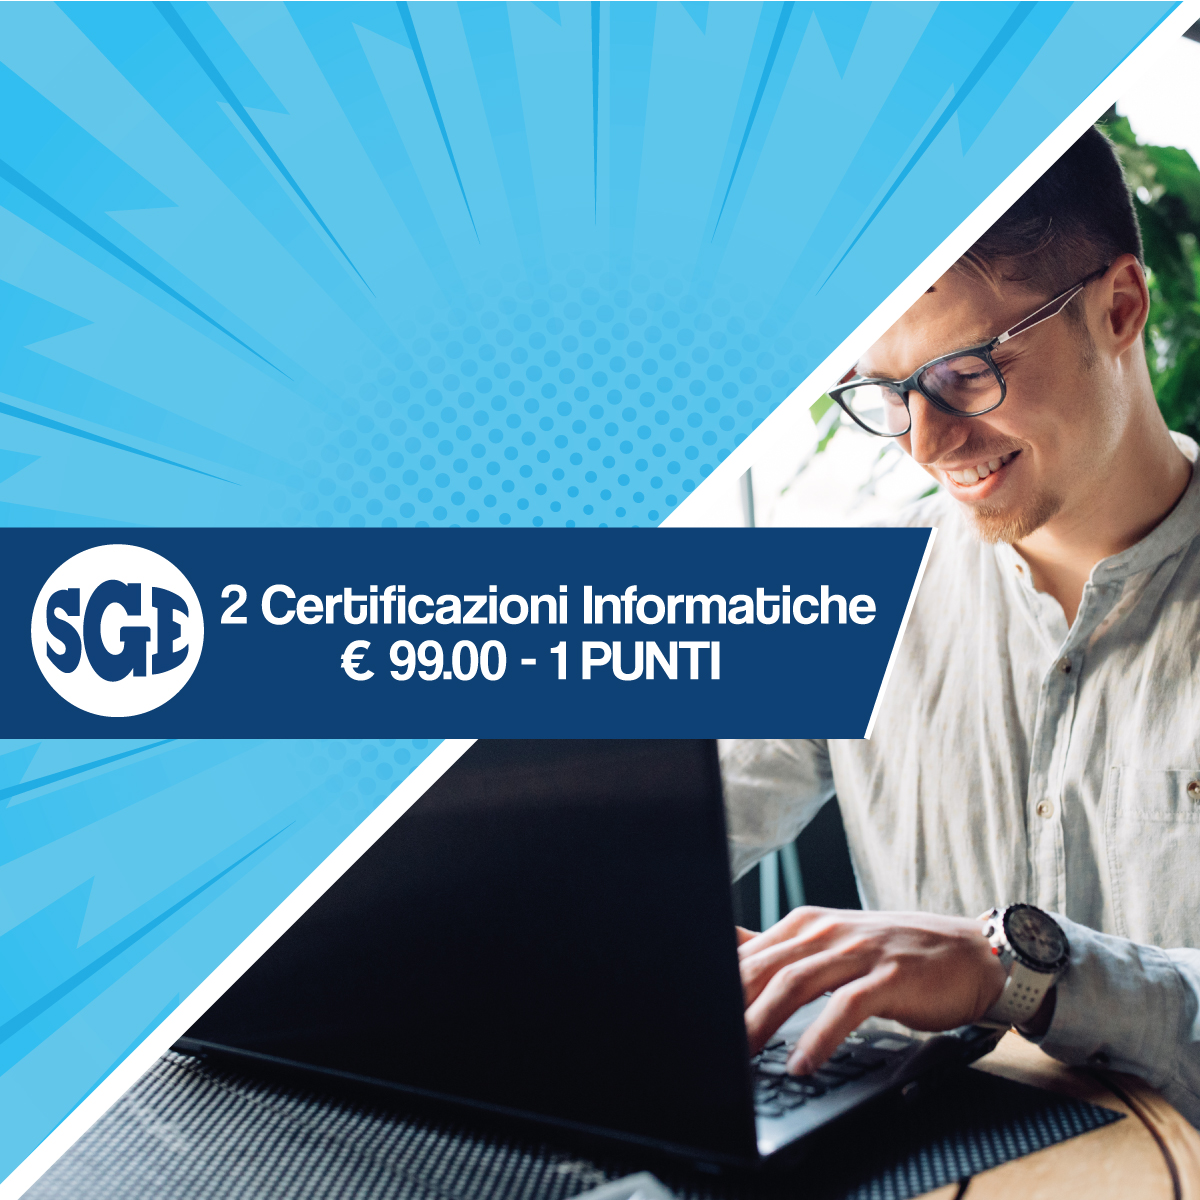 2 Certificazioni Informatiche € 99.00 - 1 PUNTI